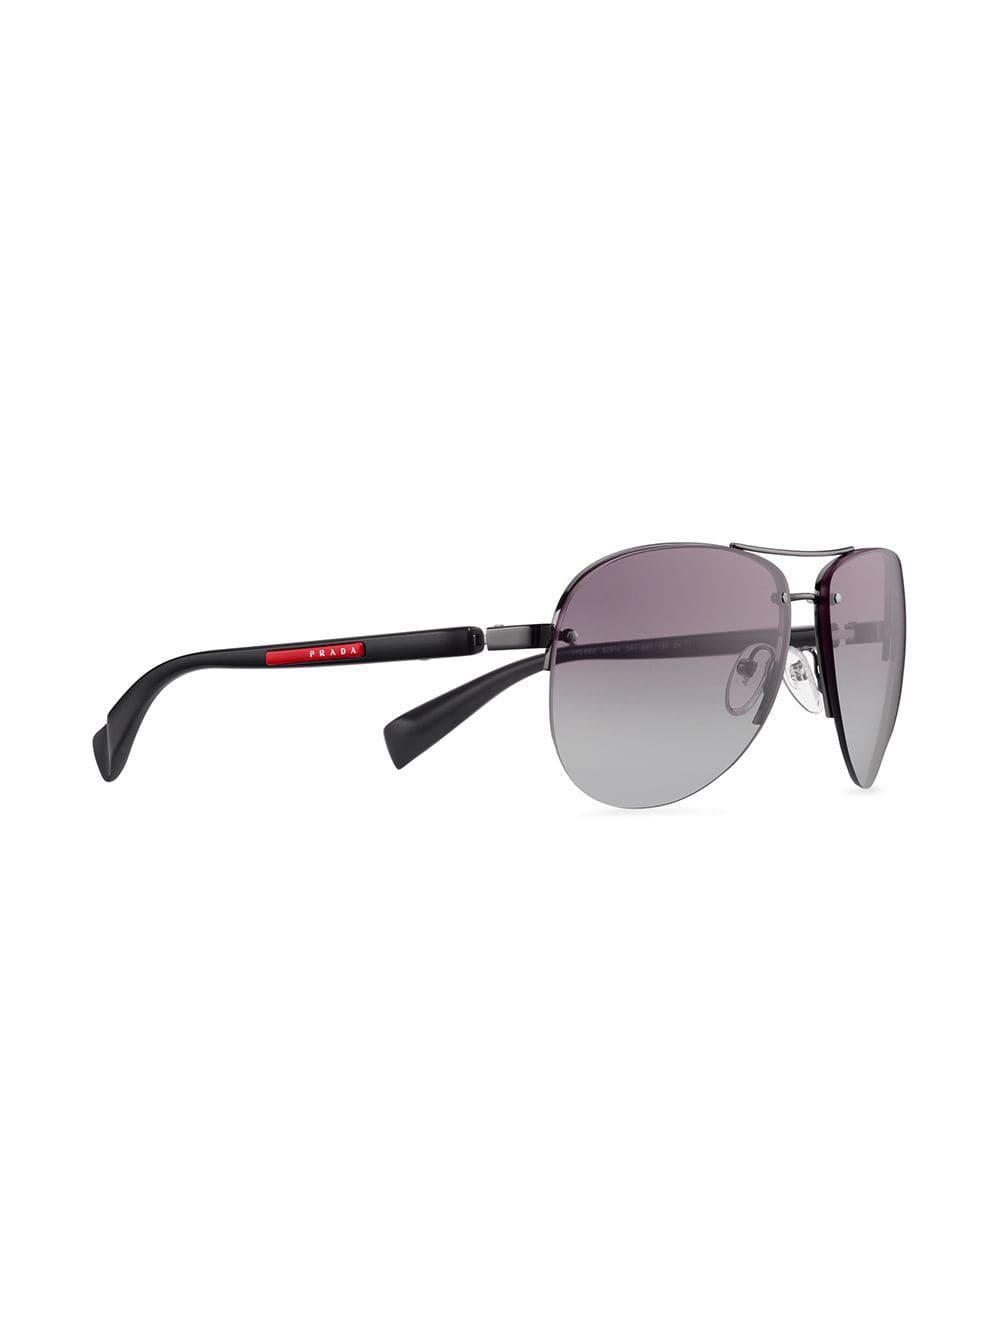 3ac65624d1bc Lyst - Prada Aviator Sunglasses in Gray for Men